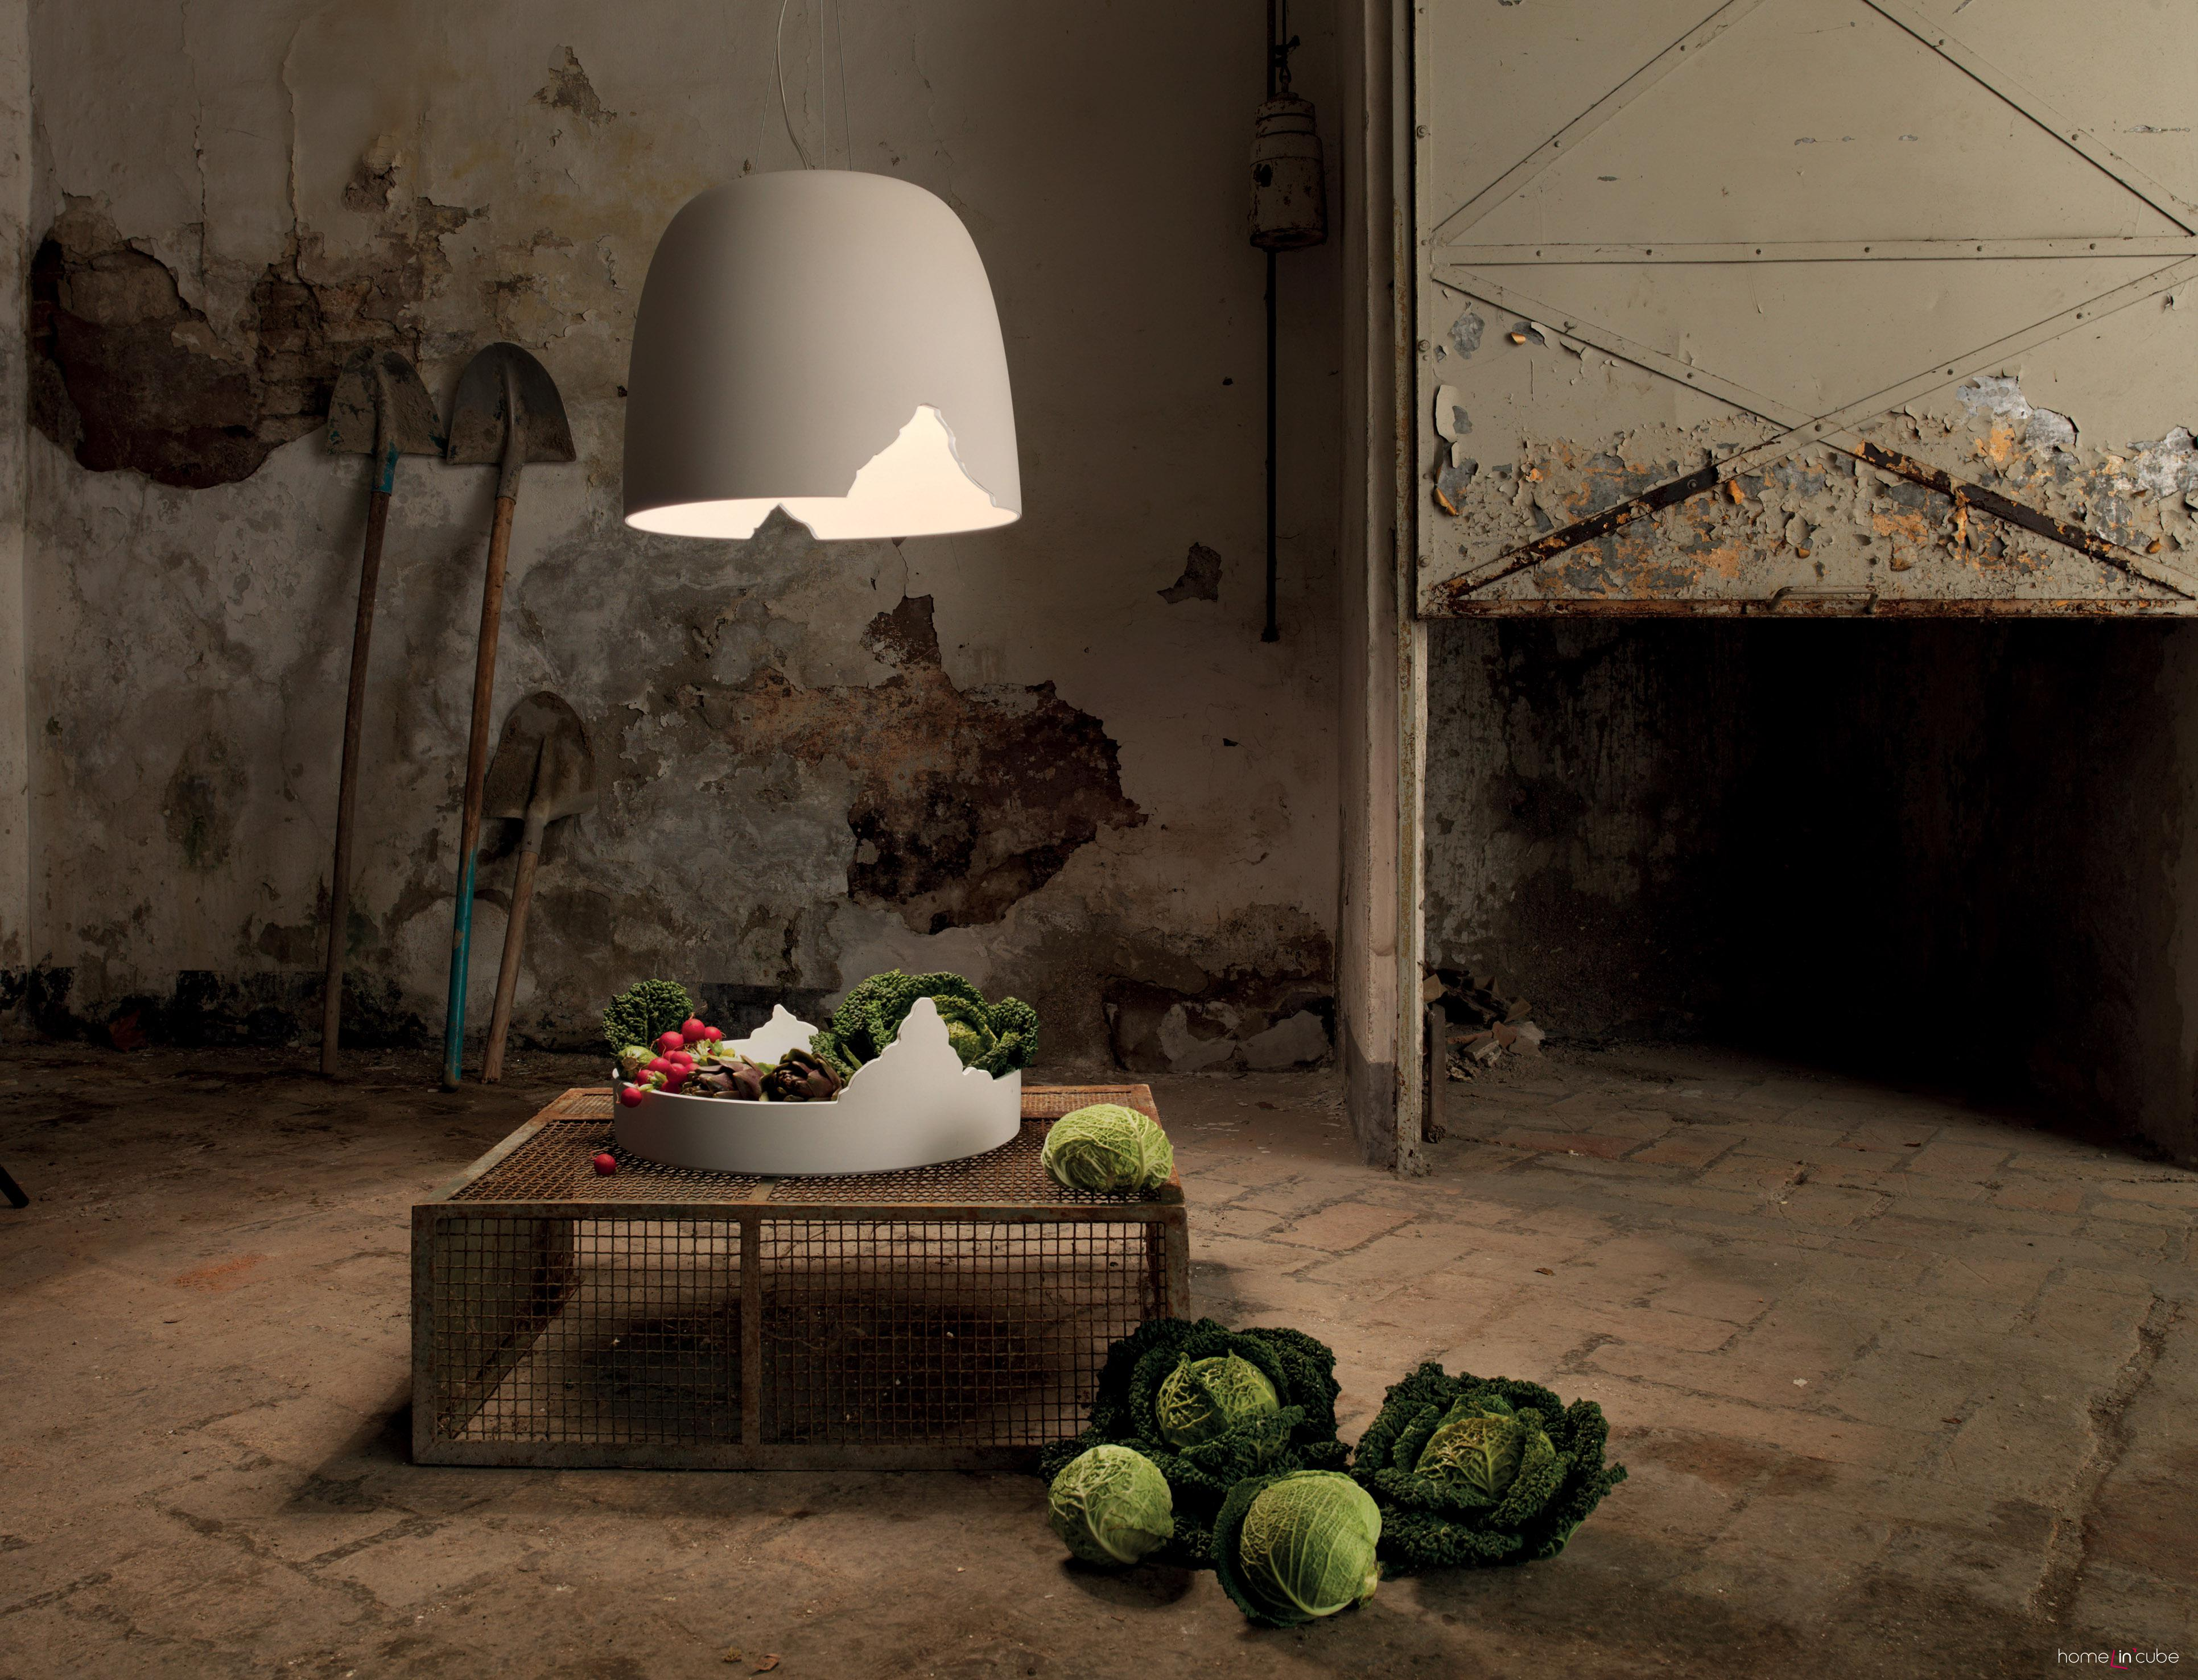 Lustr Crash (design Matteo Ugolini), keramika, průměr 48 cm, výška 40 cm, mísa má průměr 48 cm a výšku 19 cm. Karman.